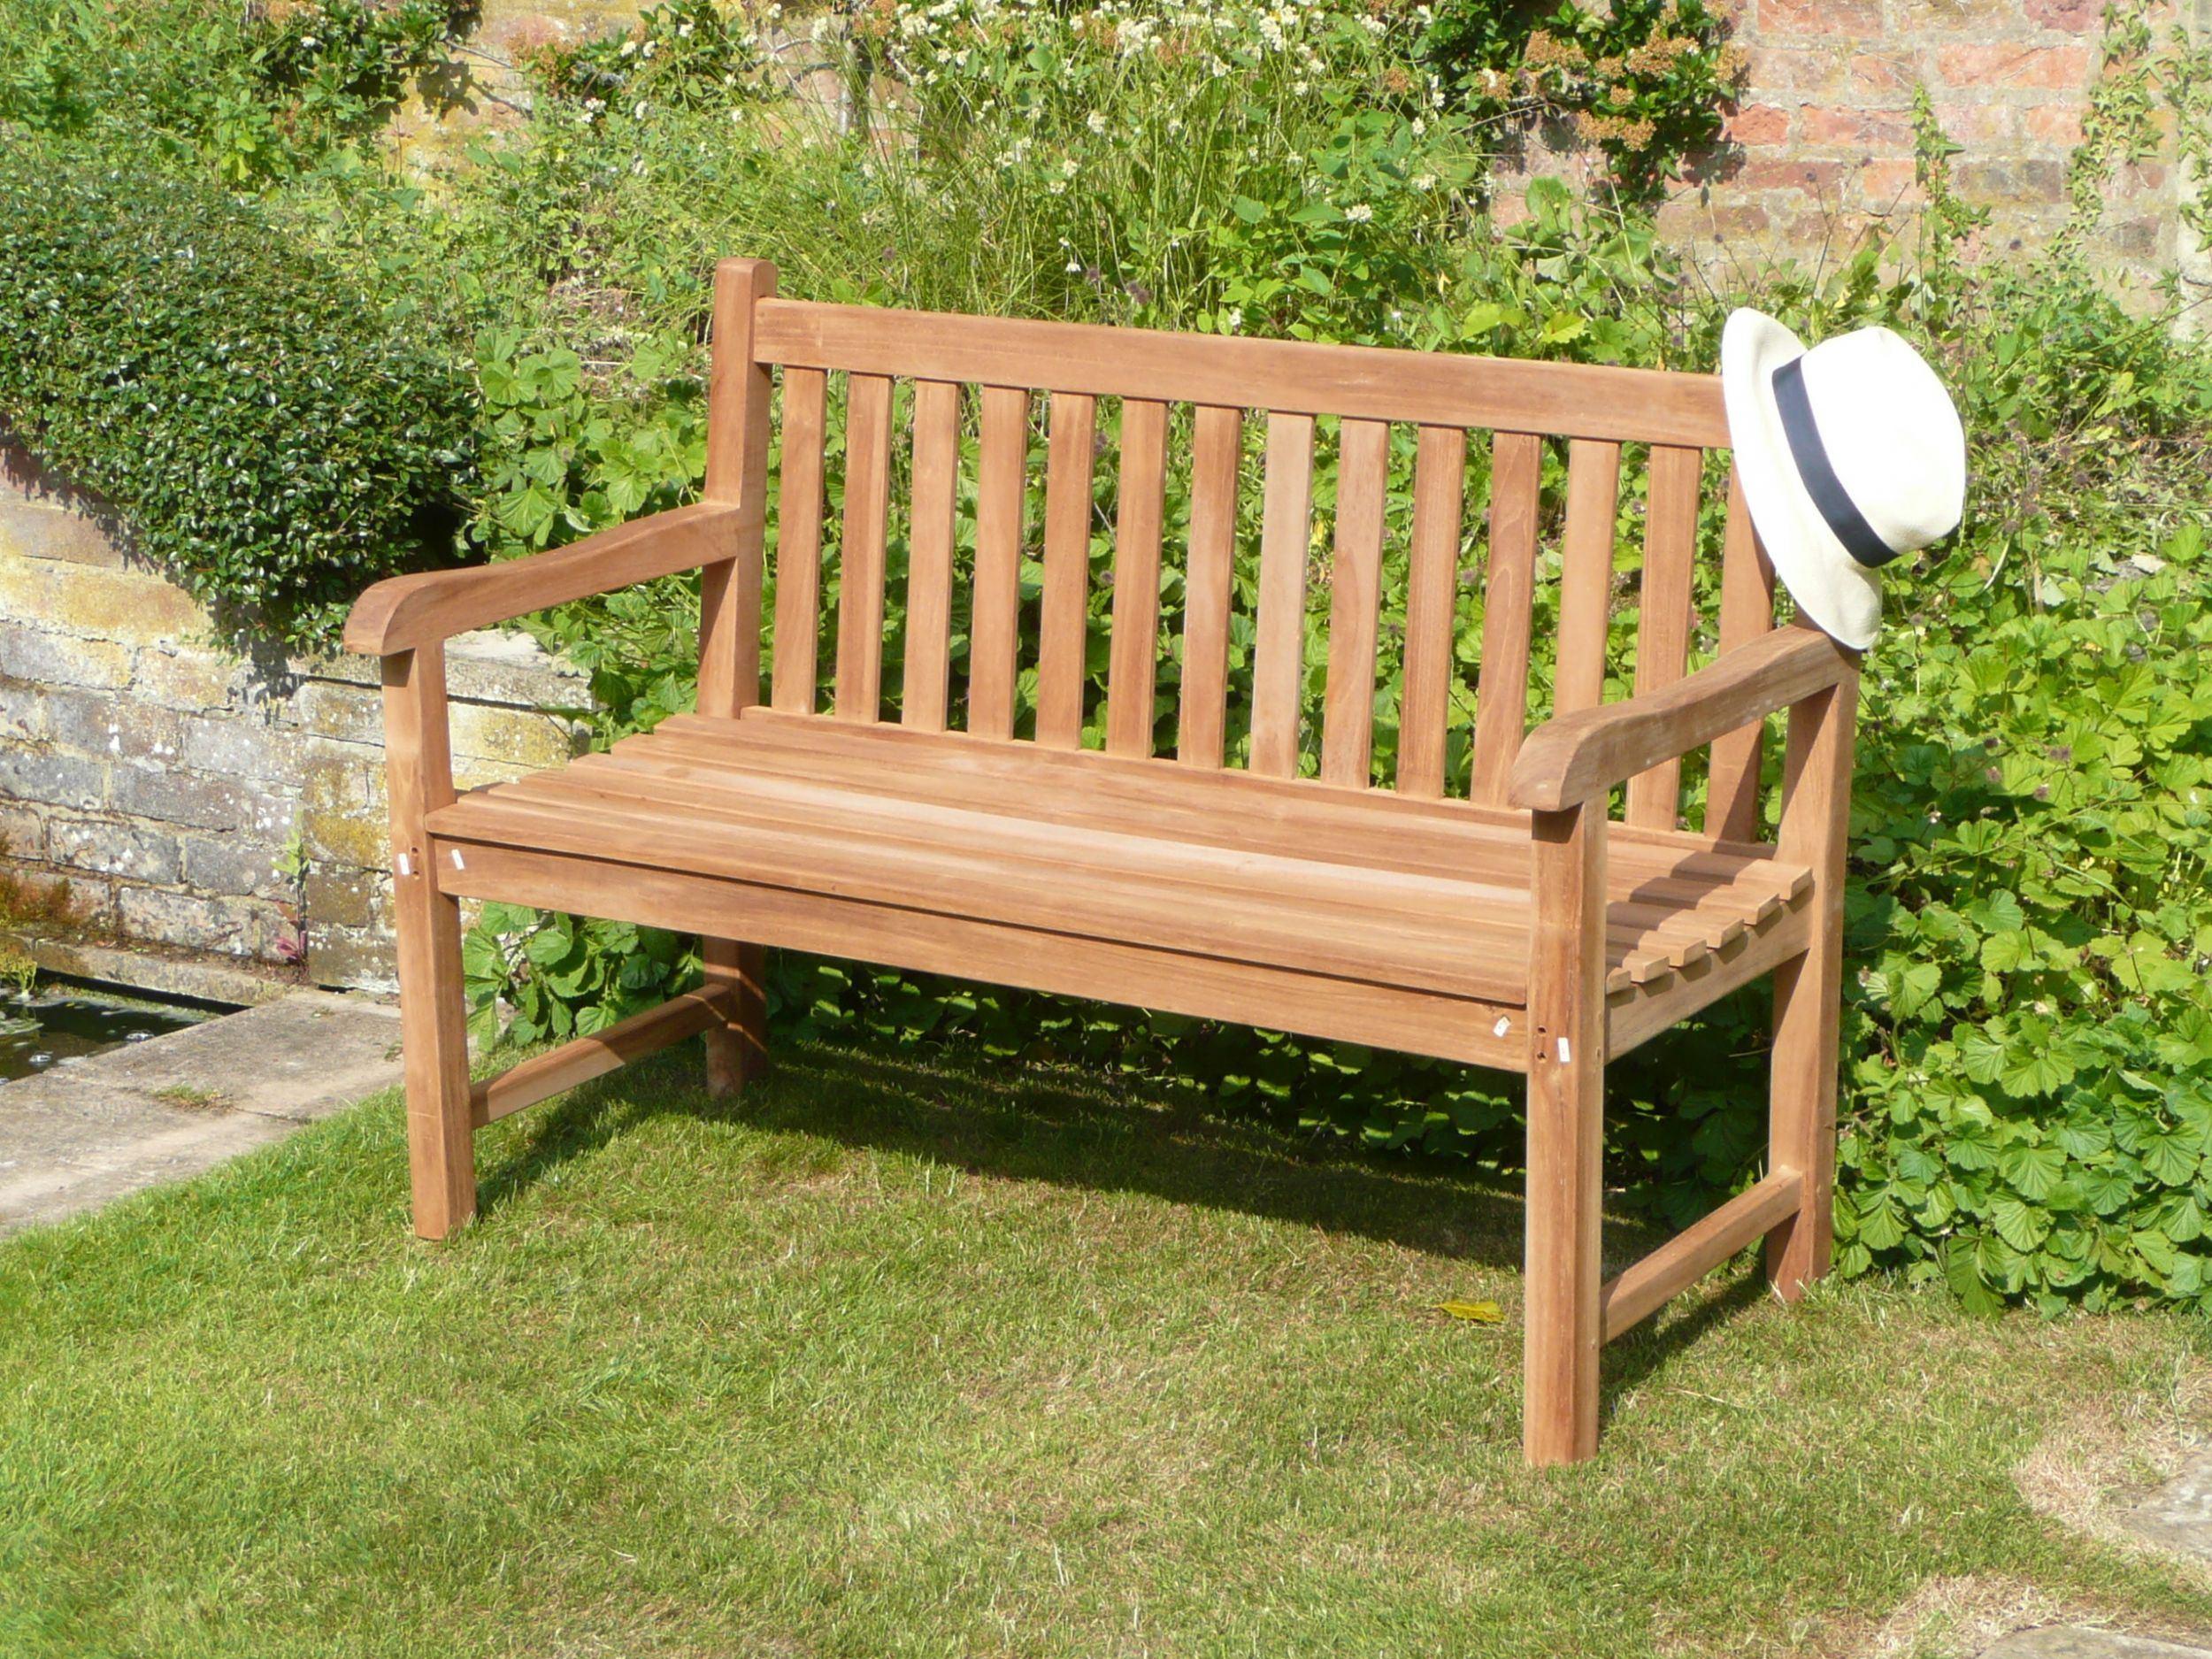 Teak Garden Furniture Lovable Garden Bench Garden Benches Uk For regarding Teak Garden Benches Furniture